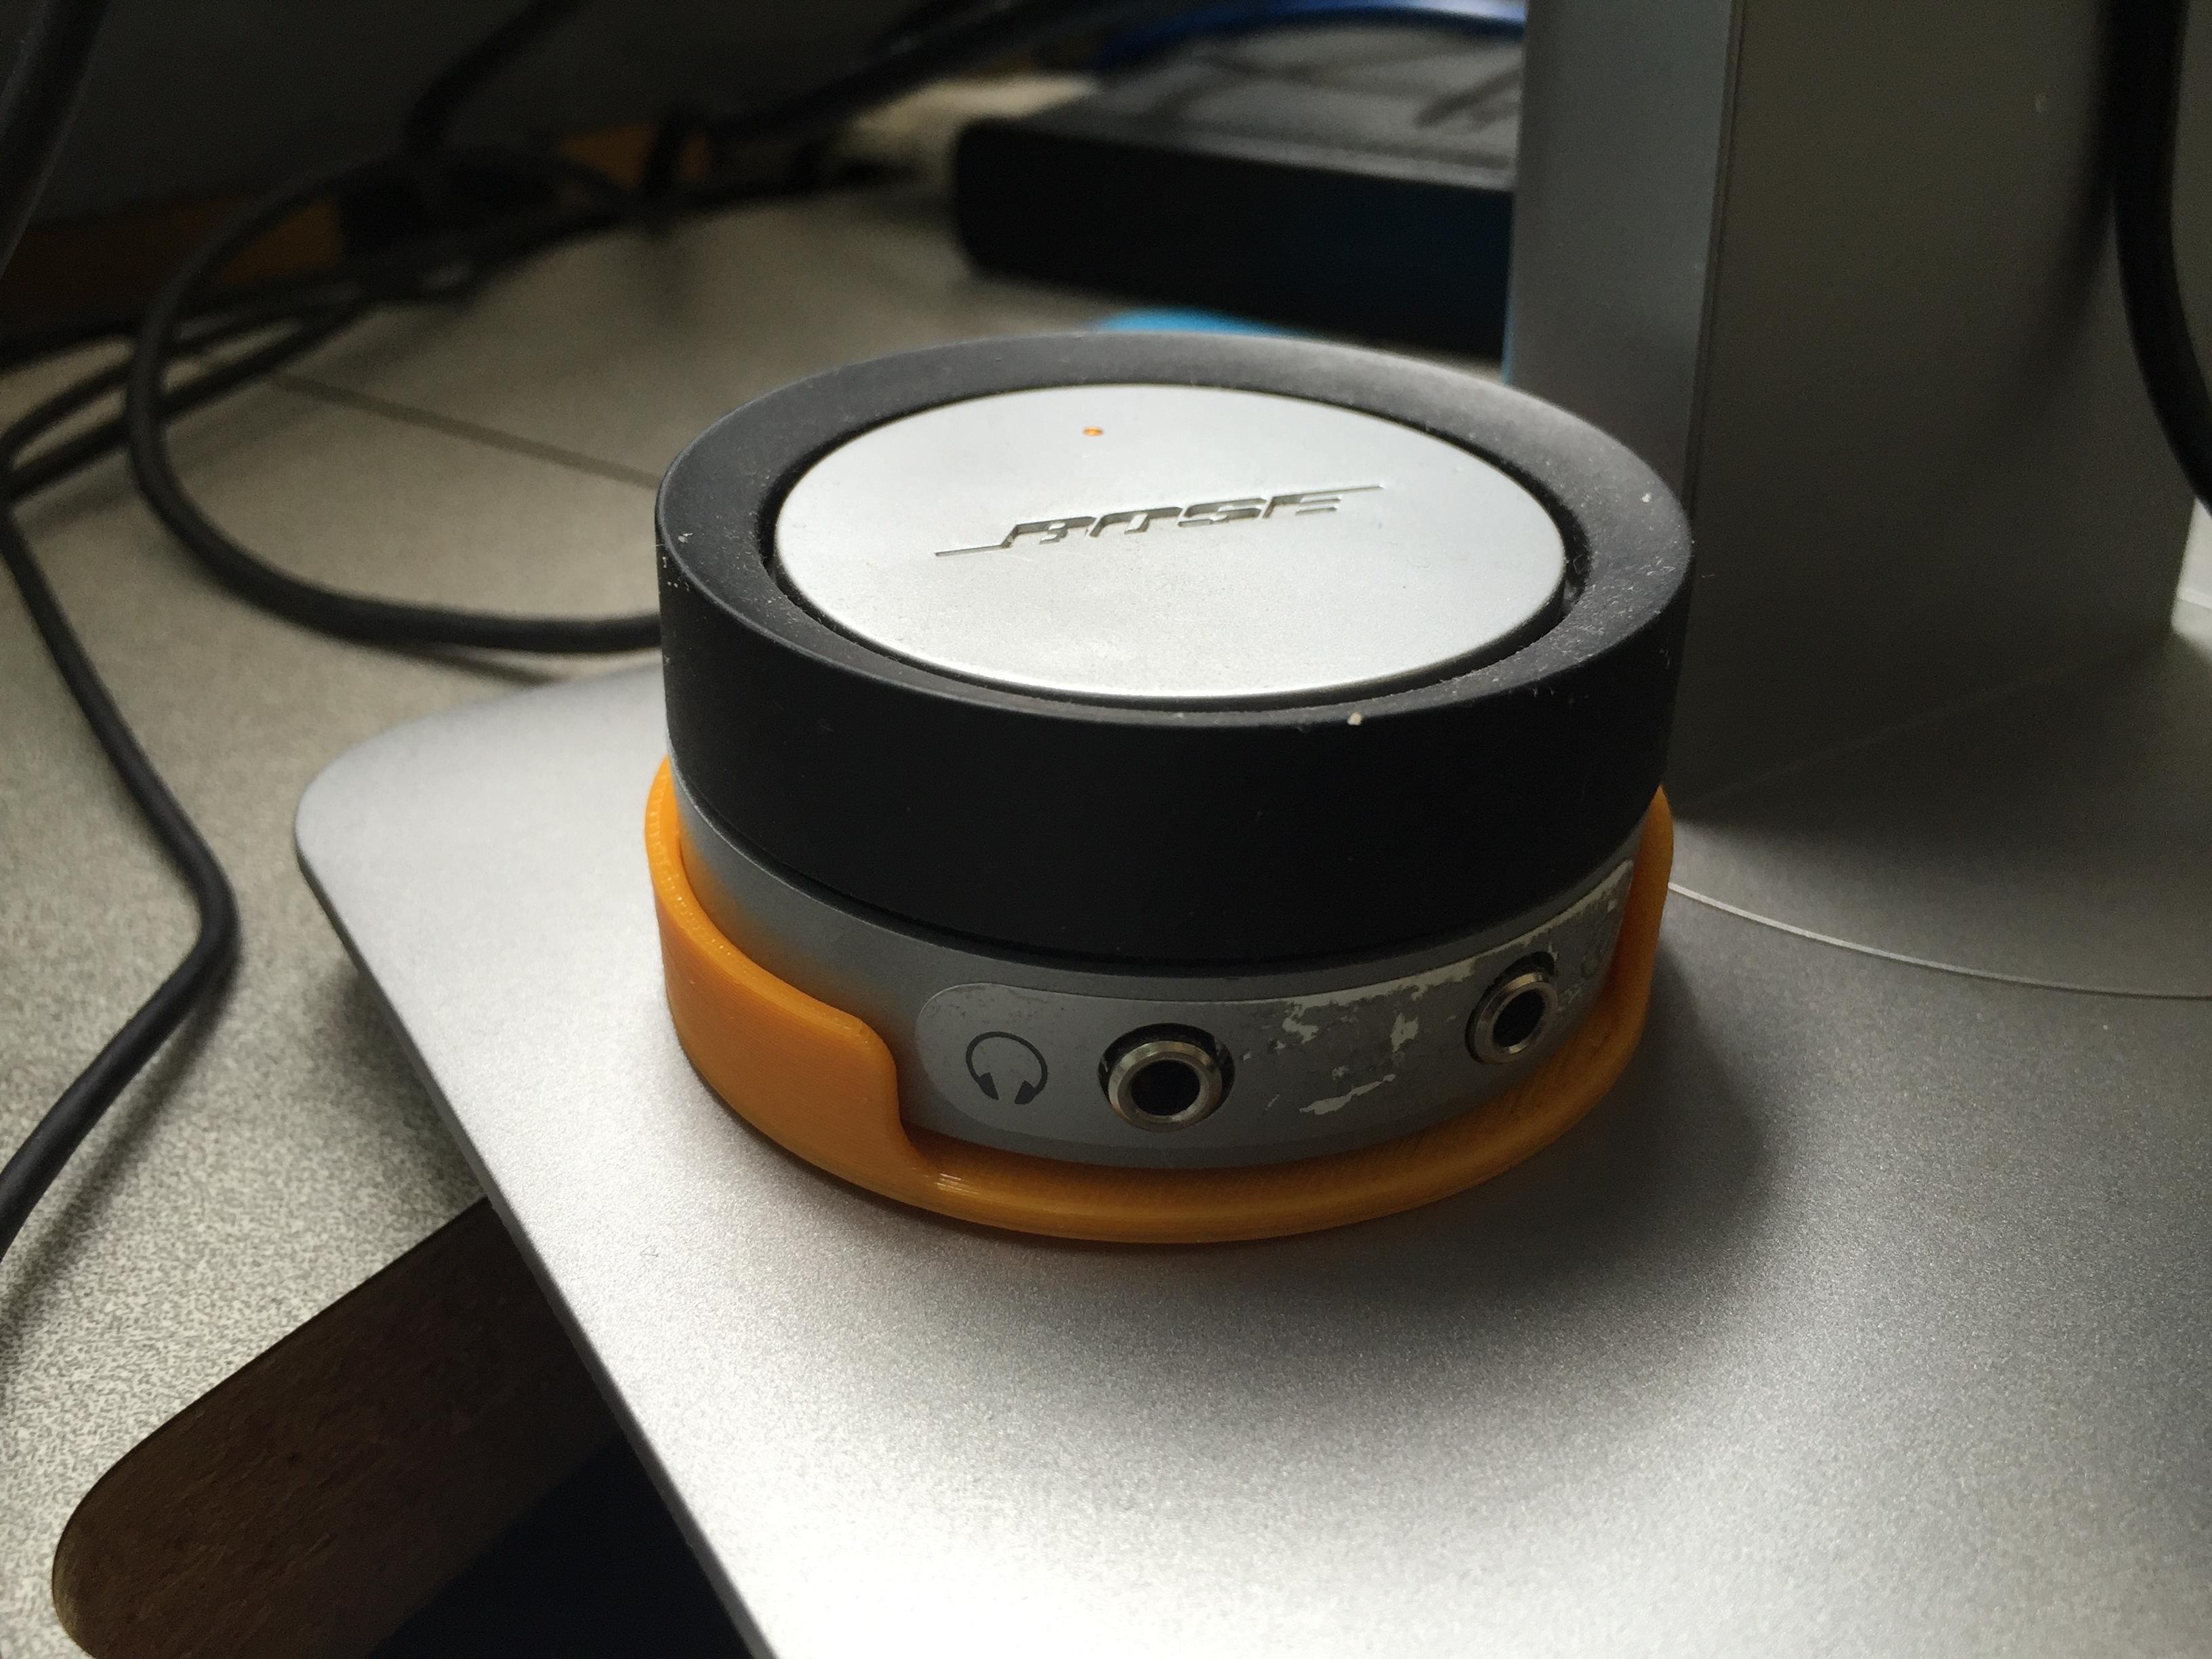 Bose Sound Control Puck Nest